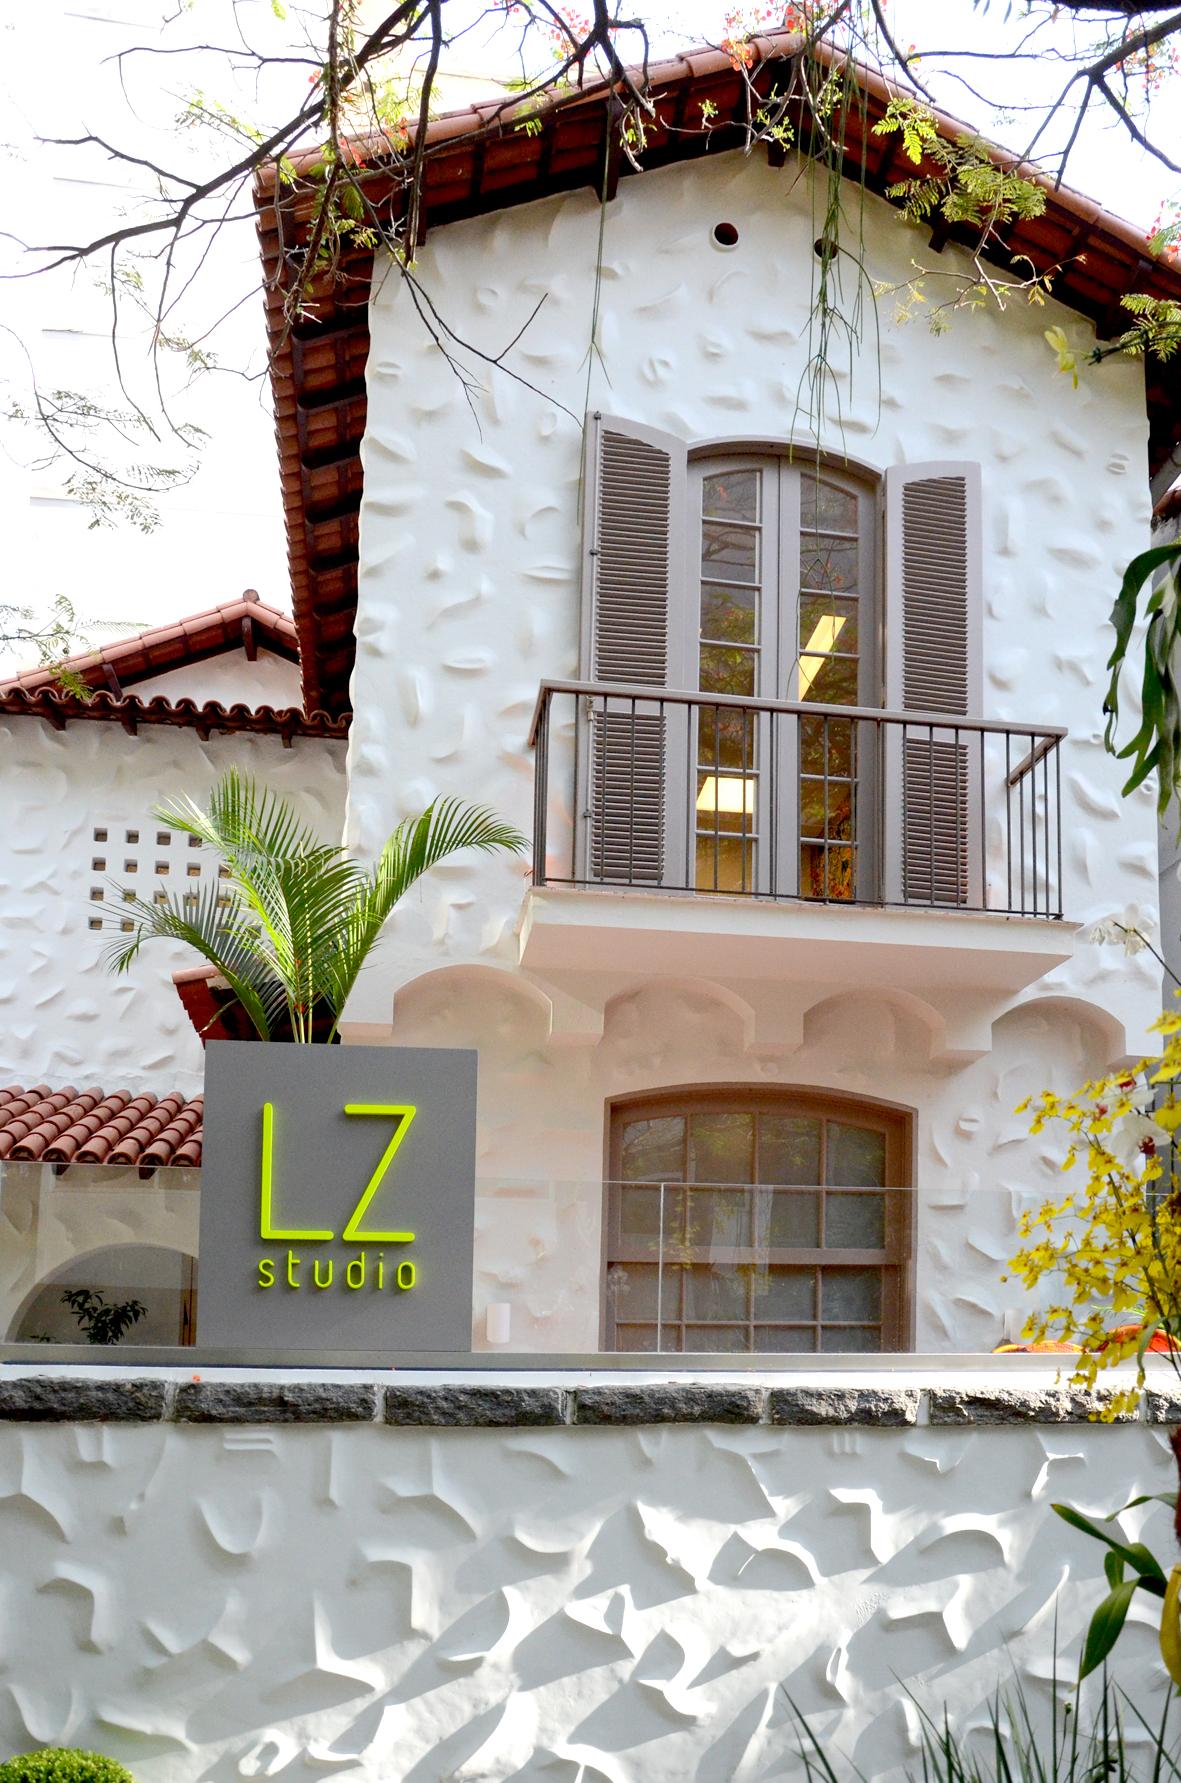 LZ Studio abre showroom em Ipanema